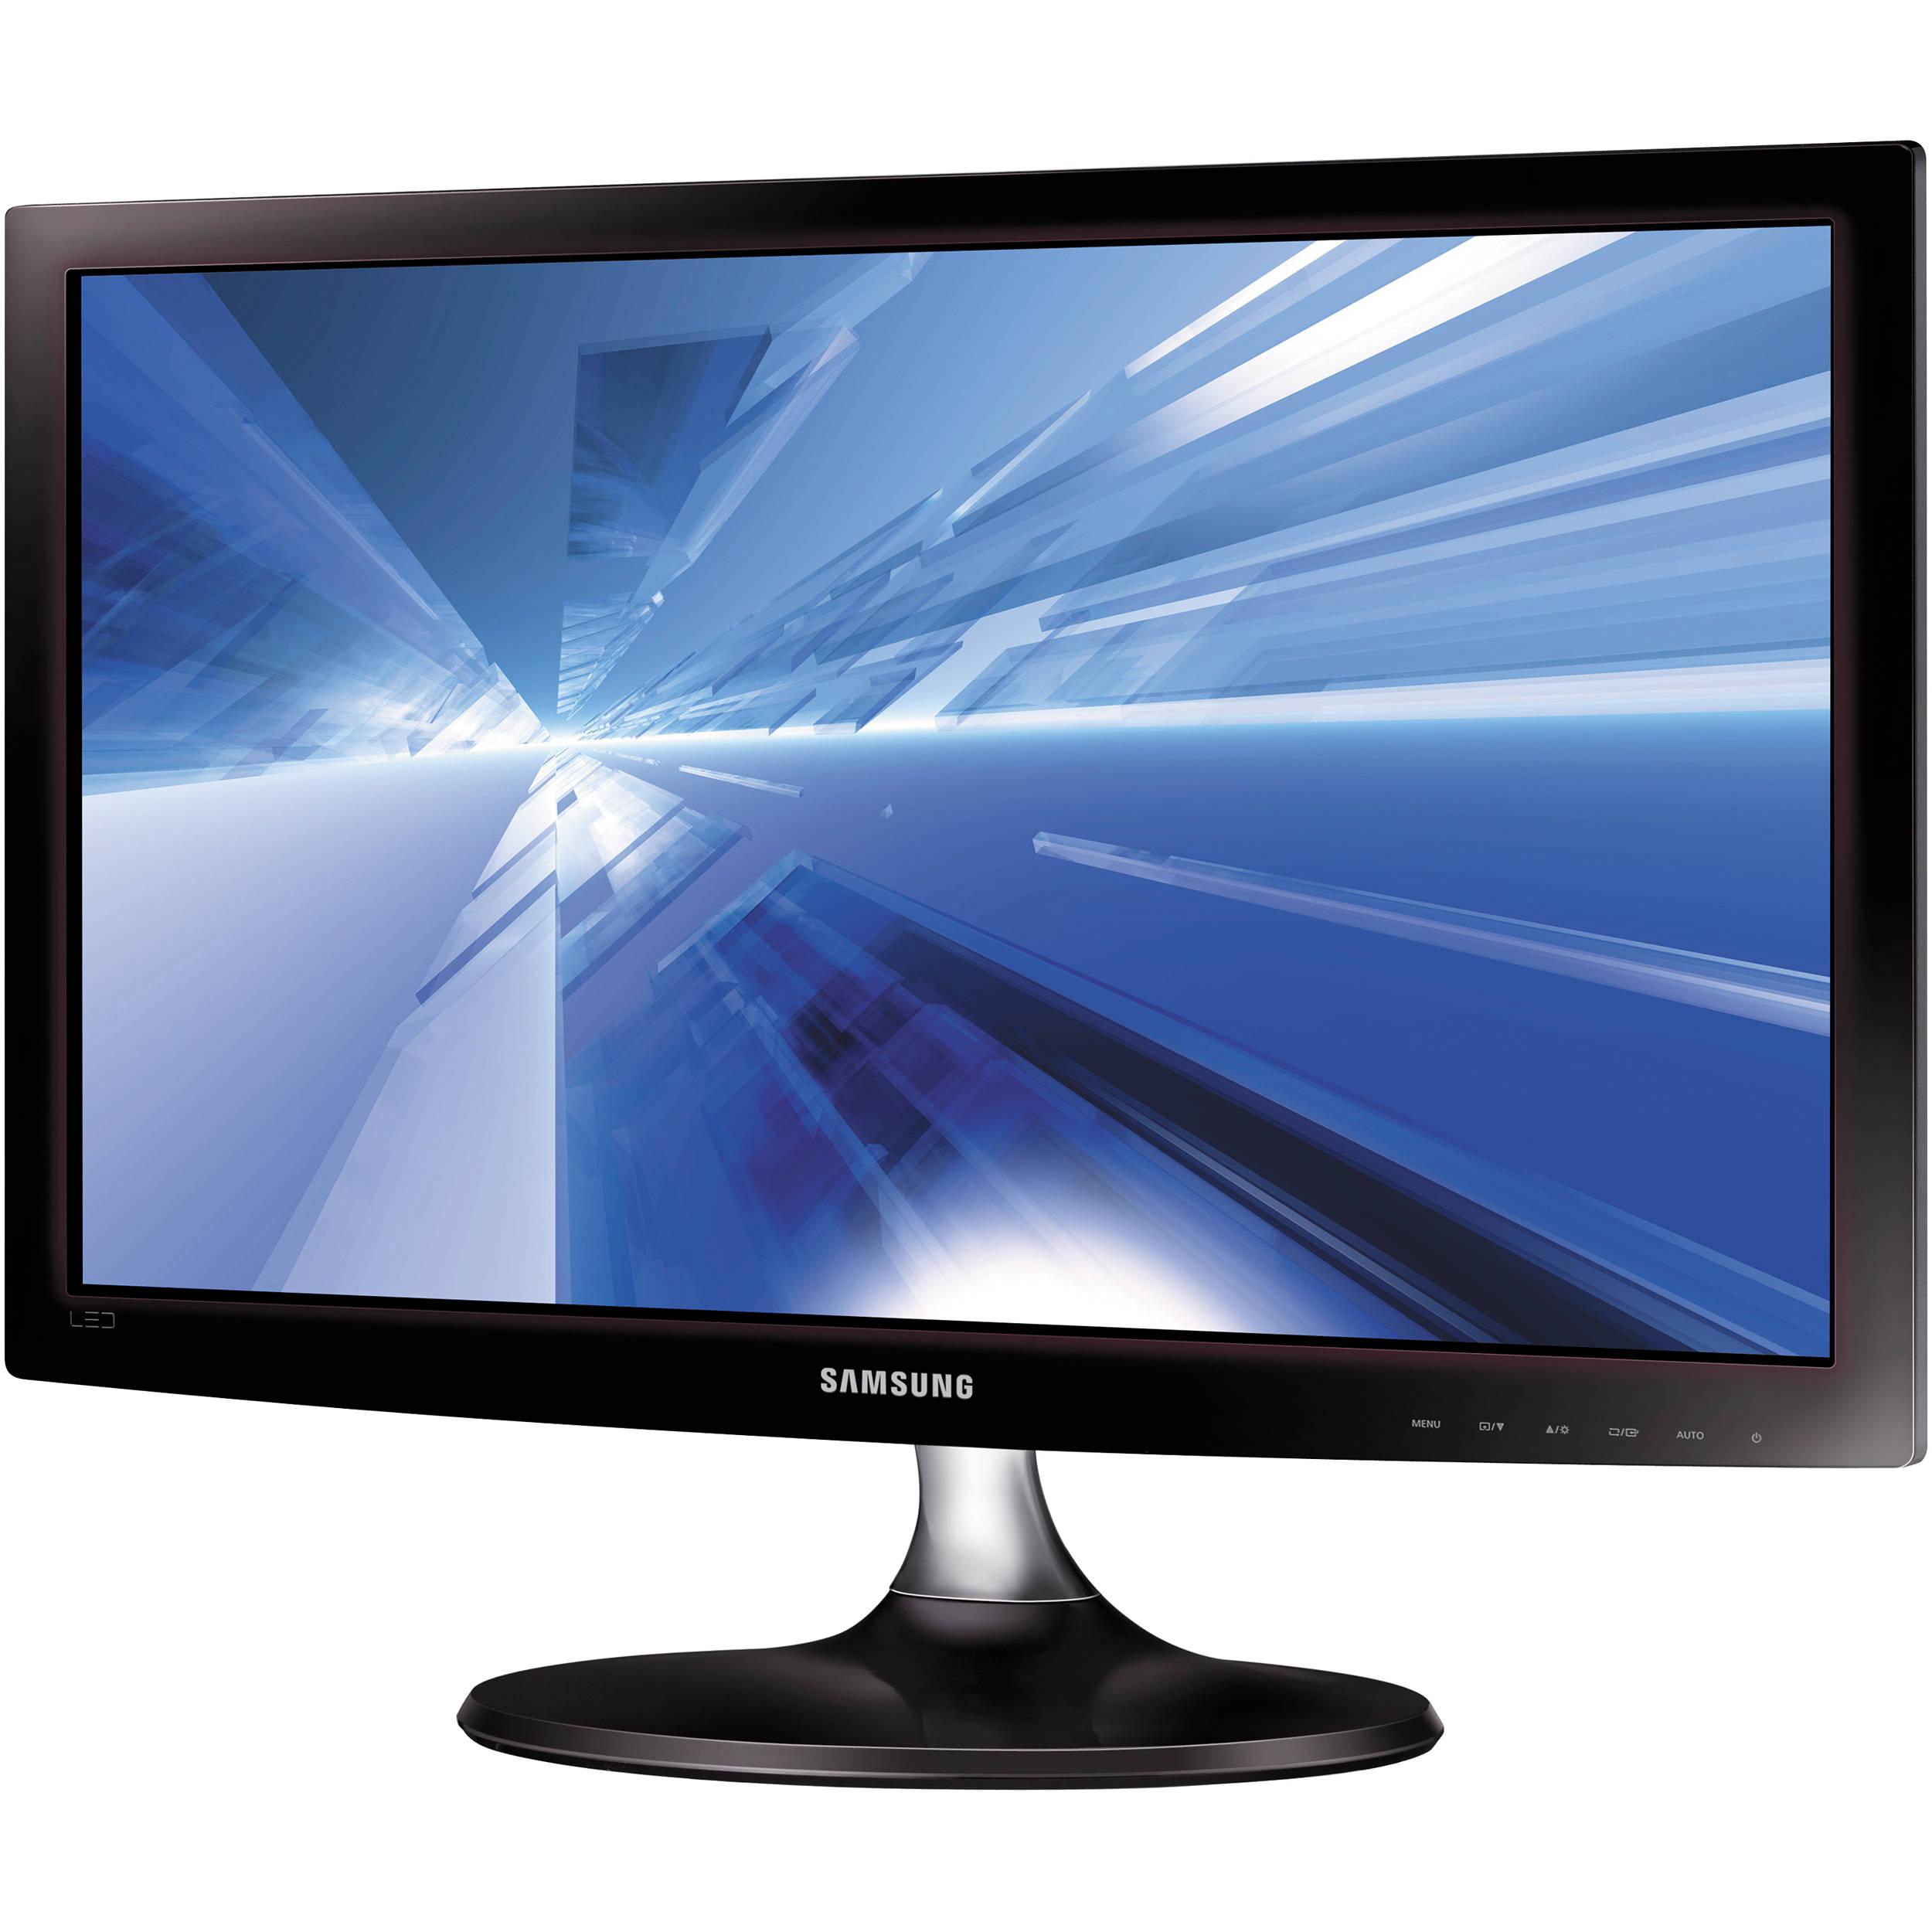 Samsung LS22C300HS/ZA LED Monitor Driver for Mac